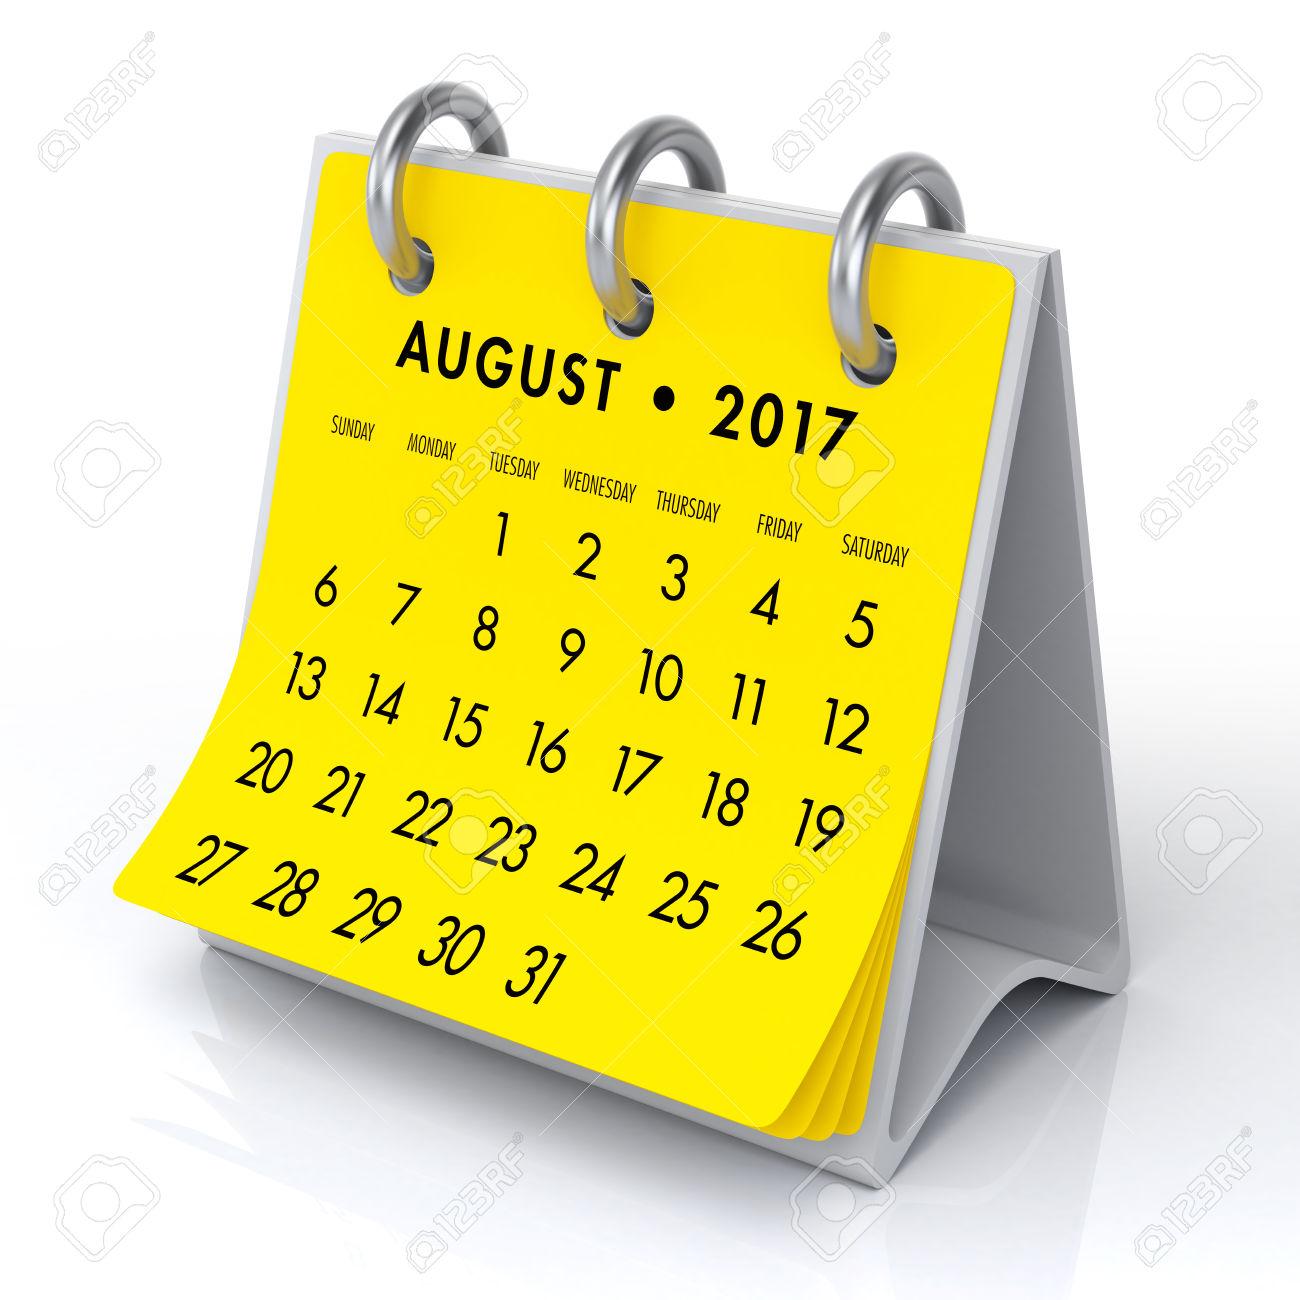 Calendar clipart aug Calendar August Template Calendar with